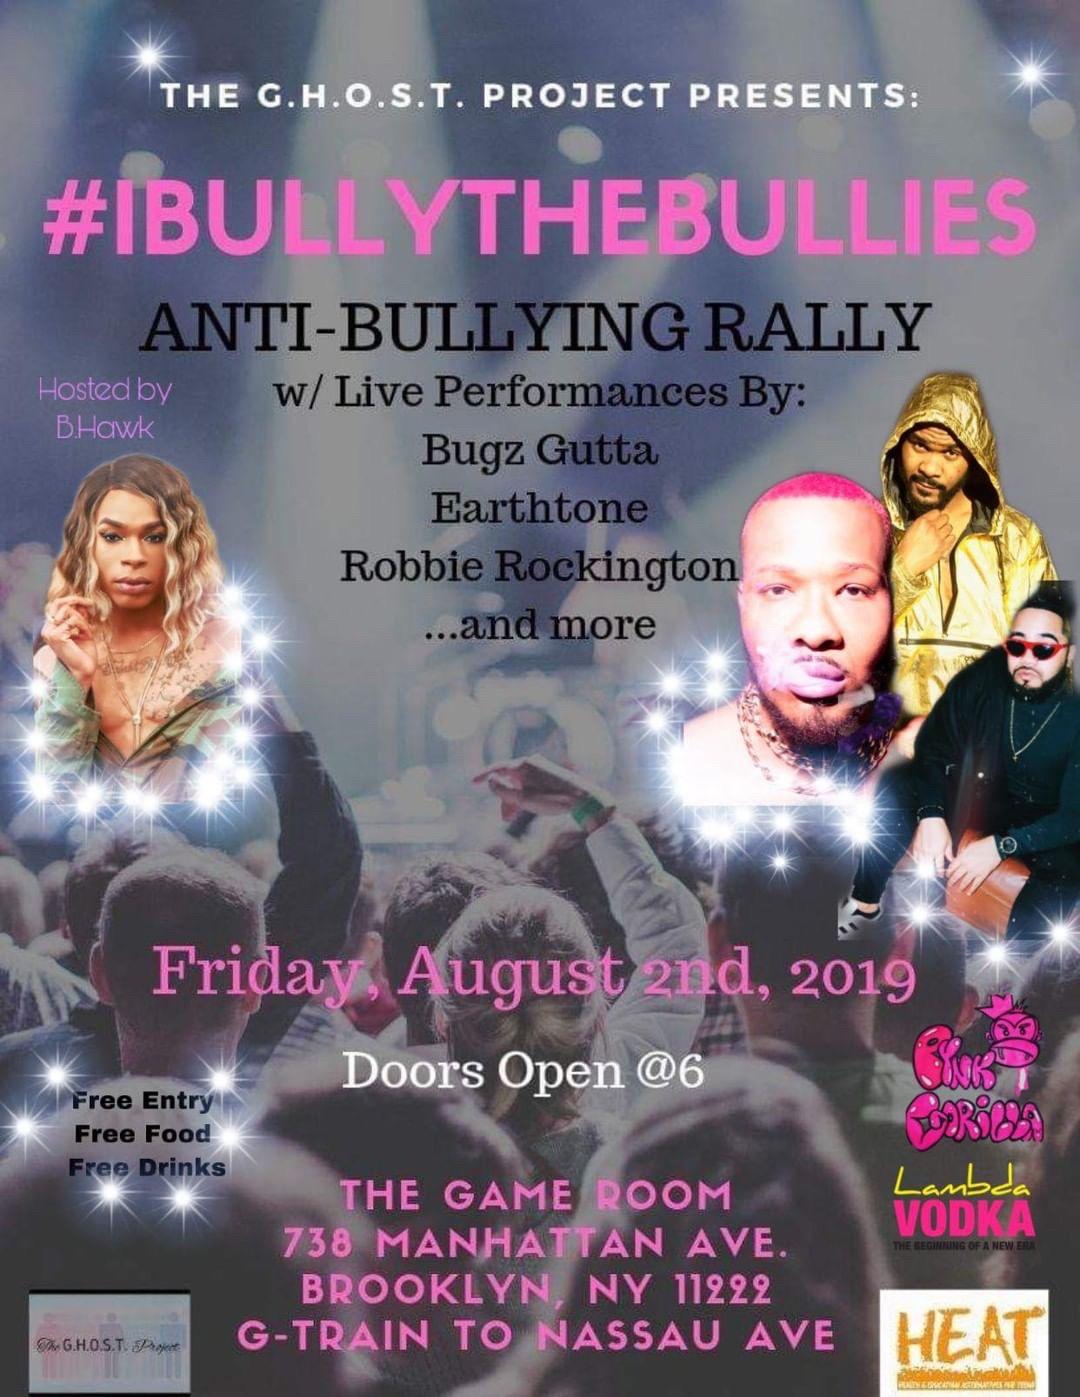 #IBULLYTHEBULLIES - ANTI-BULLYING RALLY